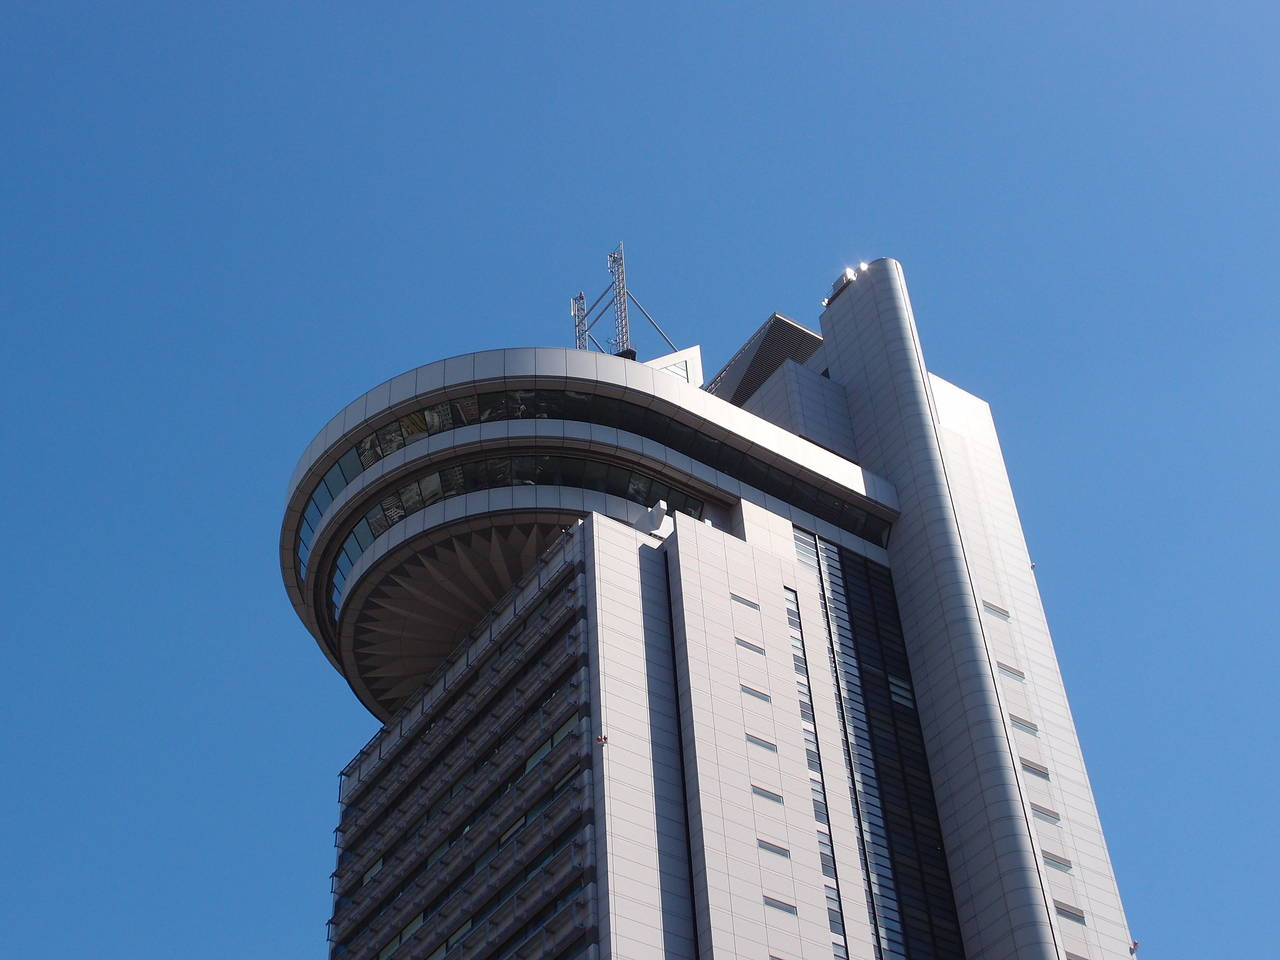 Bunyko Civic Center